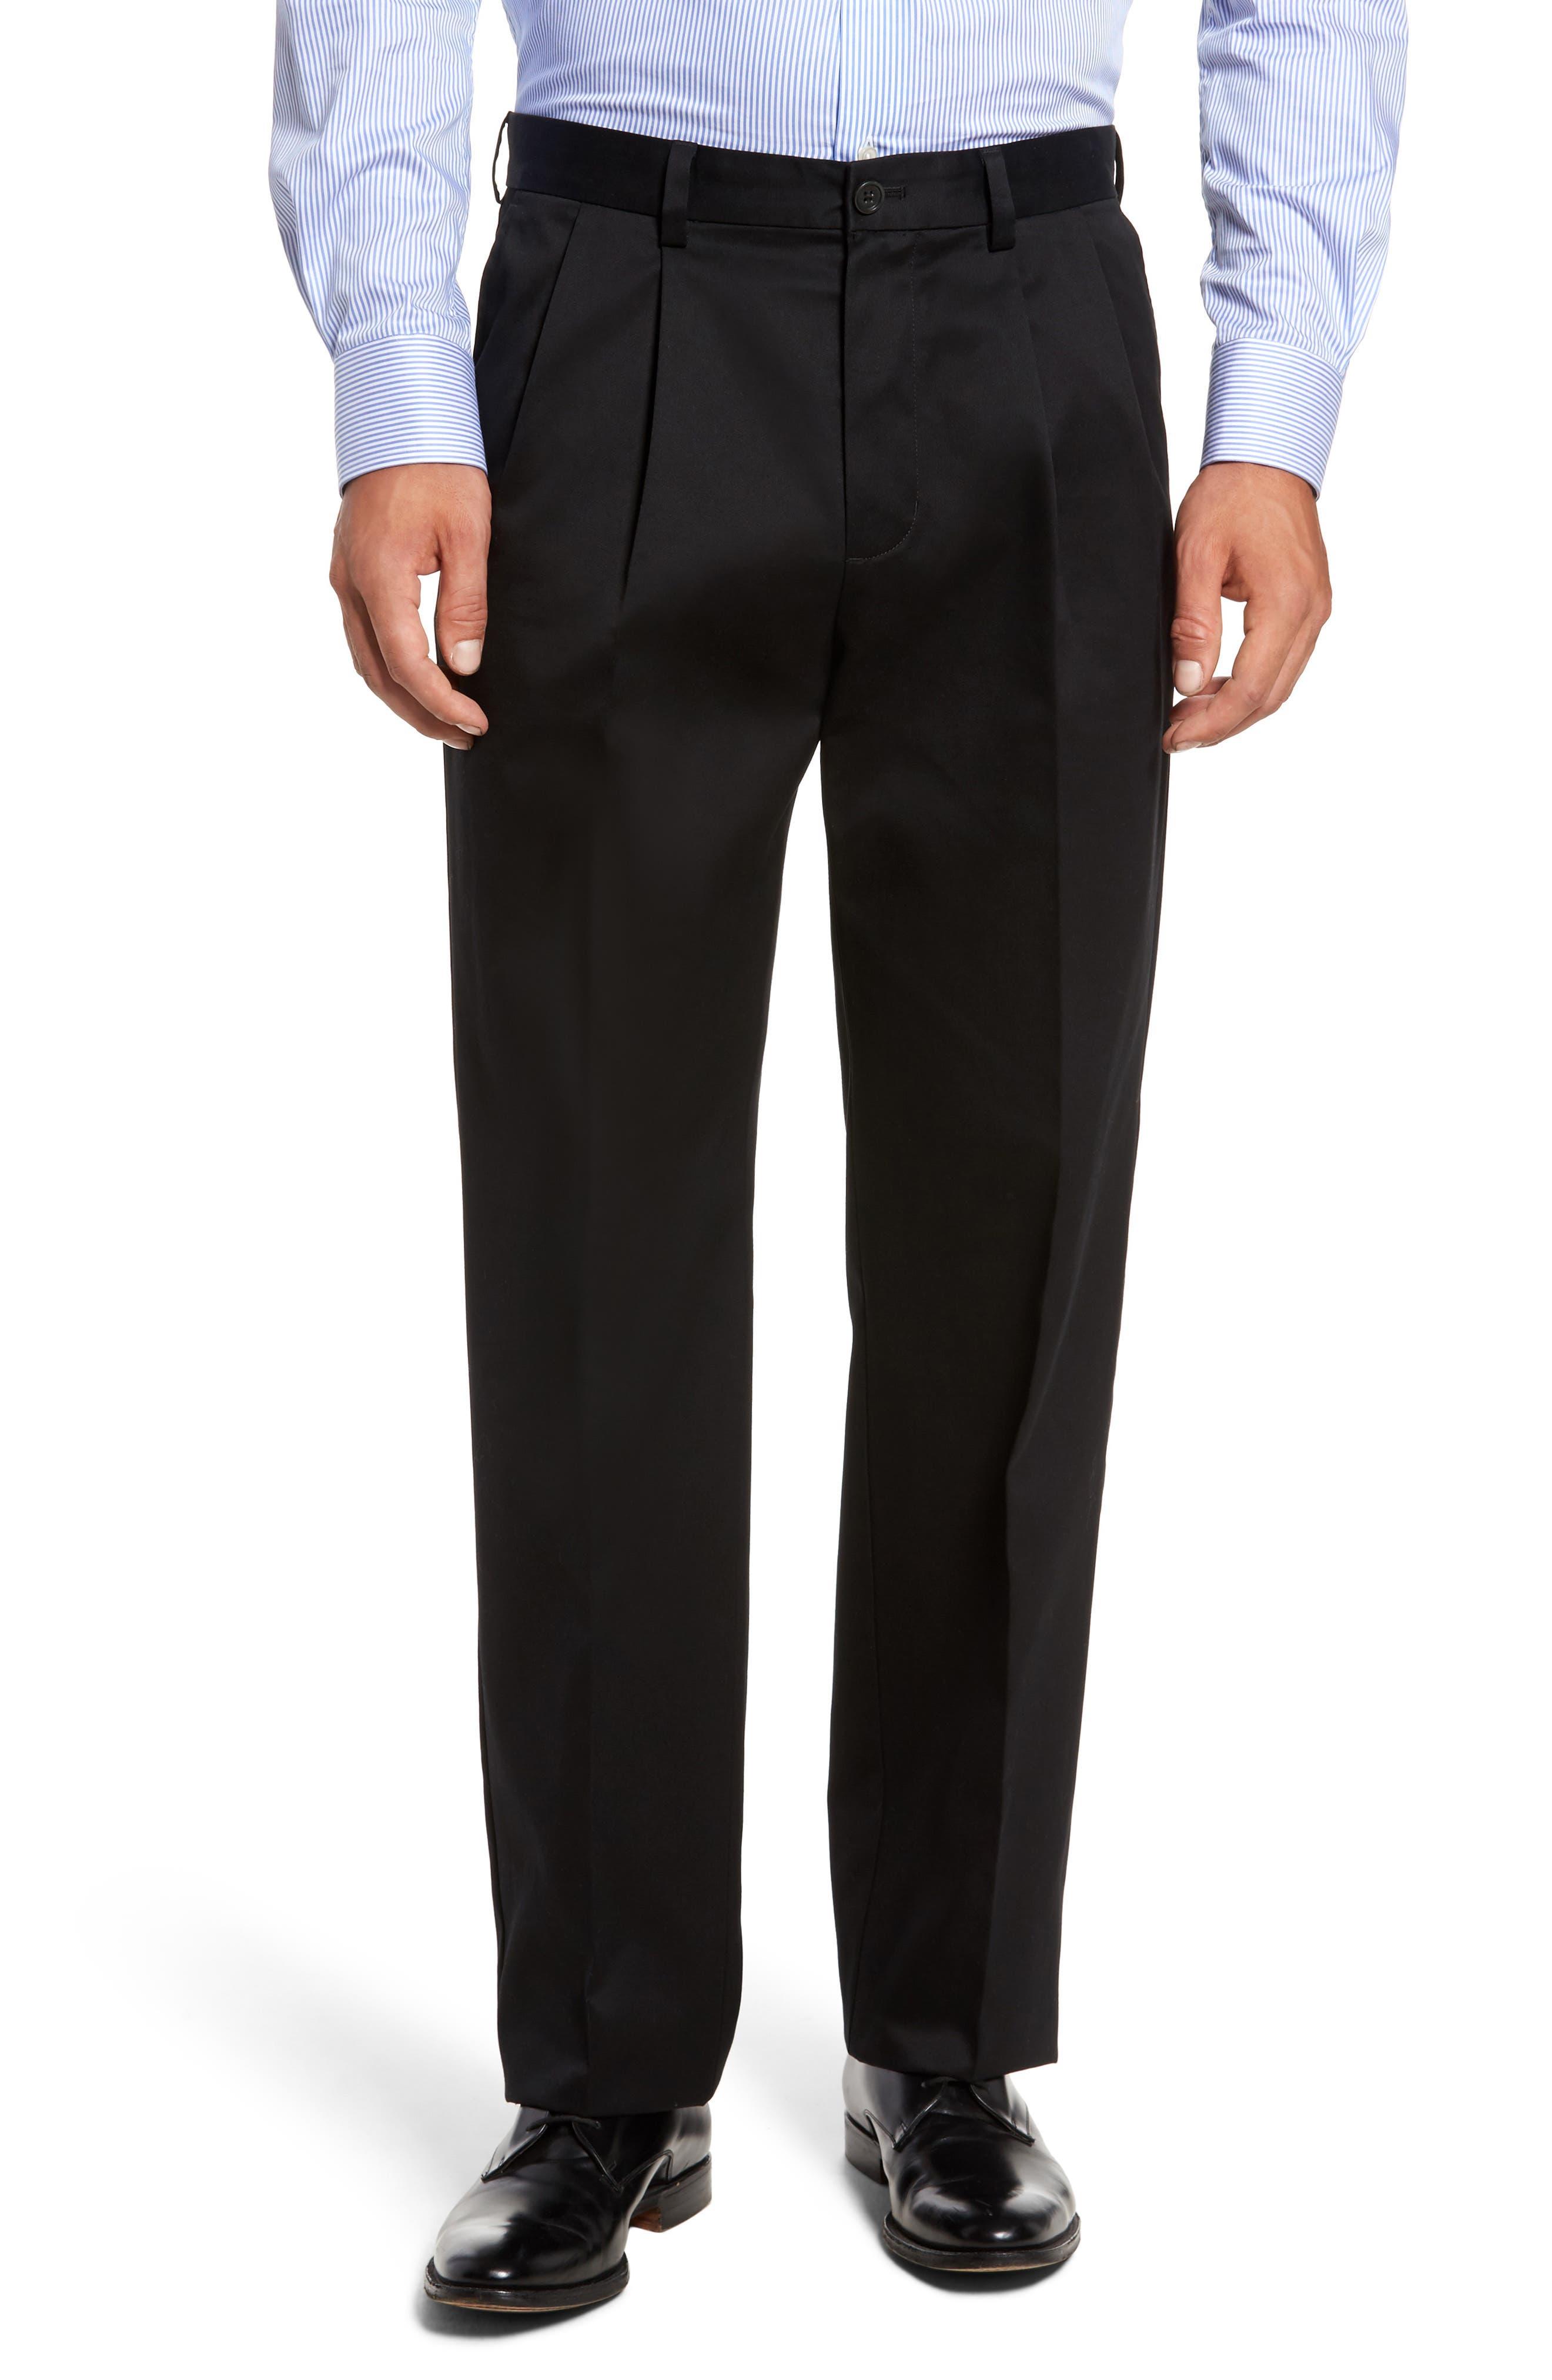 NORDSTROM MEN'S SHOP, 'Classic' Smartcare<sup>™</sup> Relaxed Fit Double Pleated Cotton Pants, Main thumbnail 1, color, BLACK